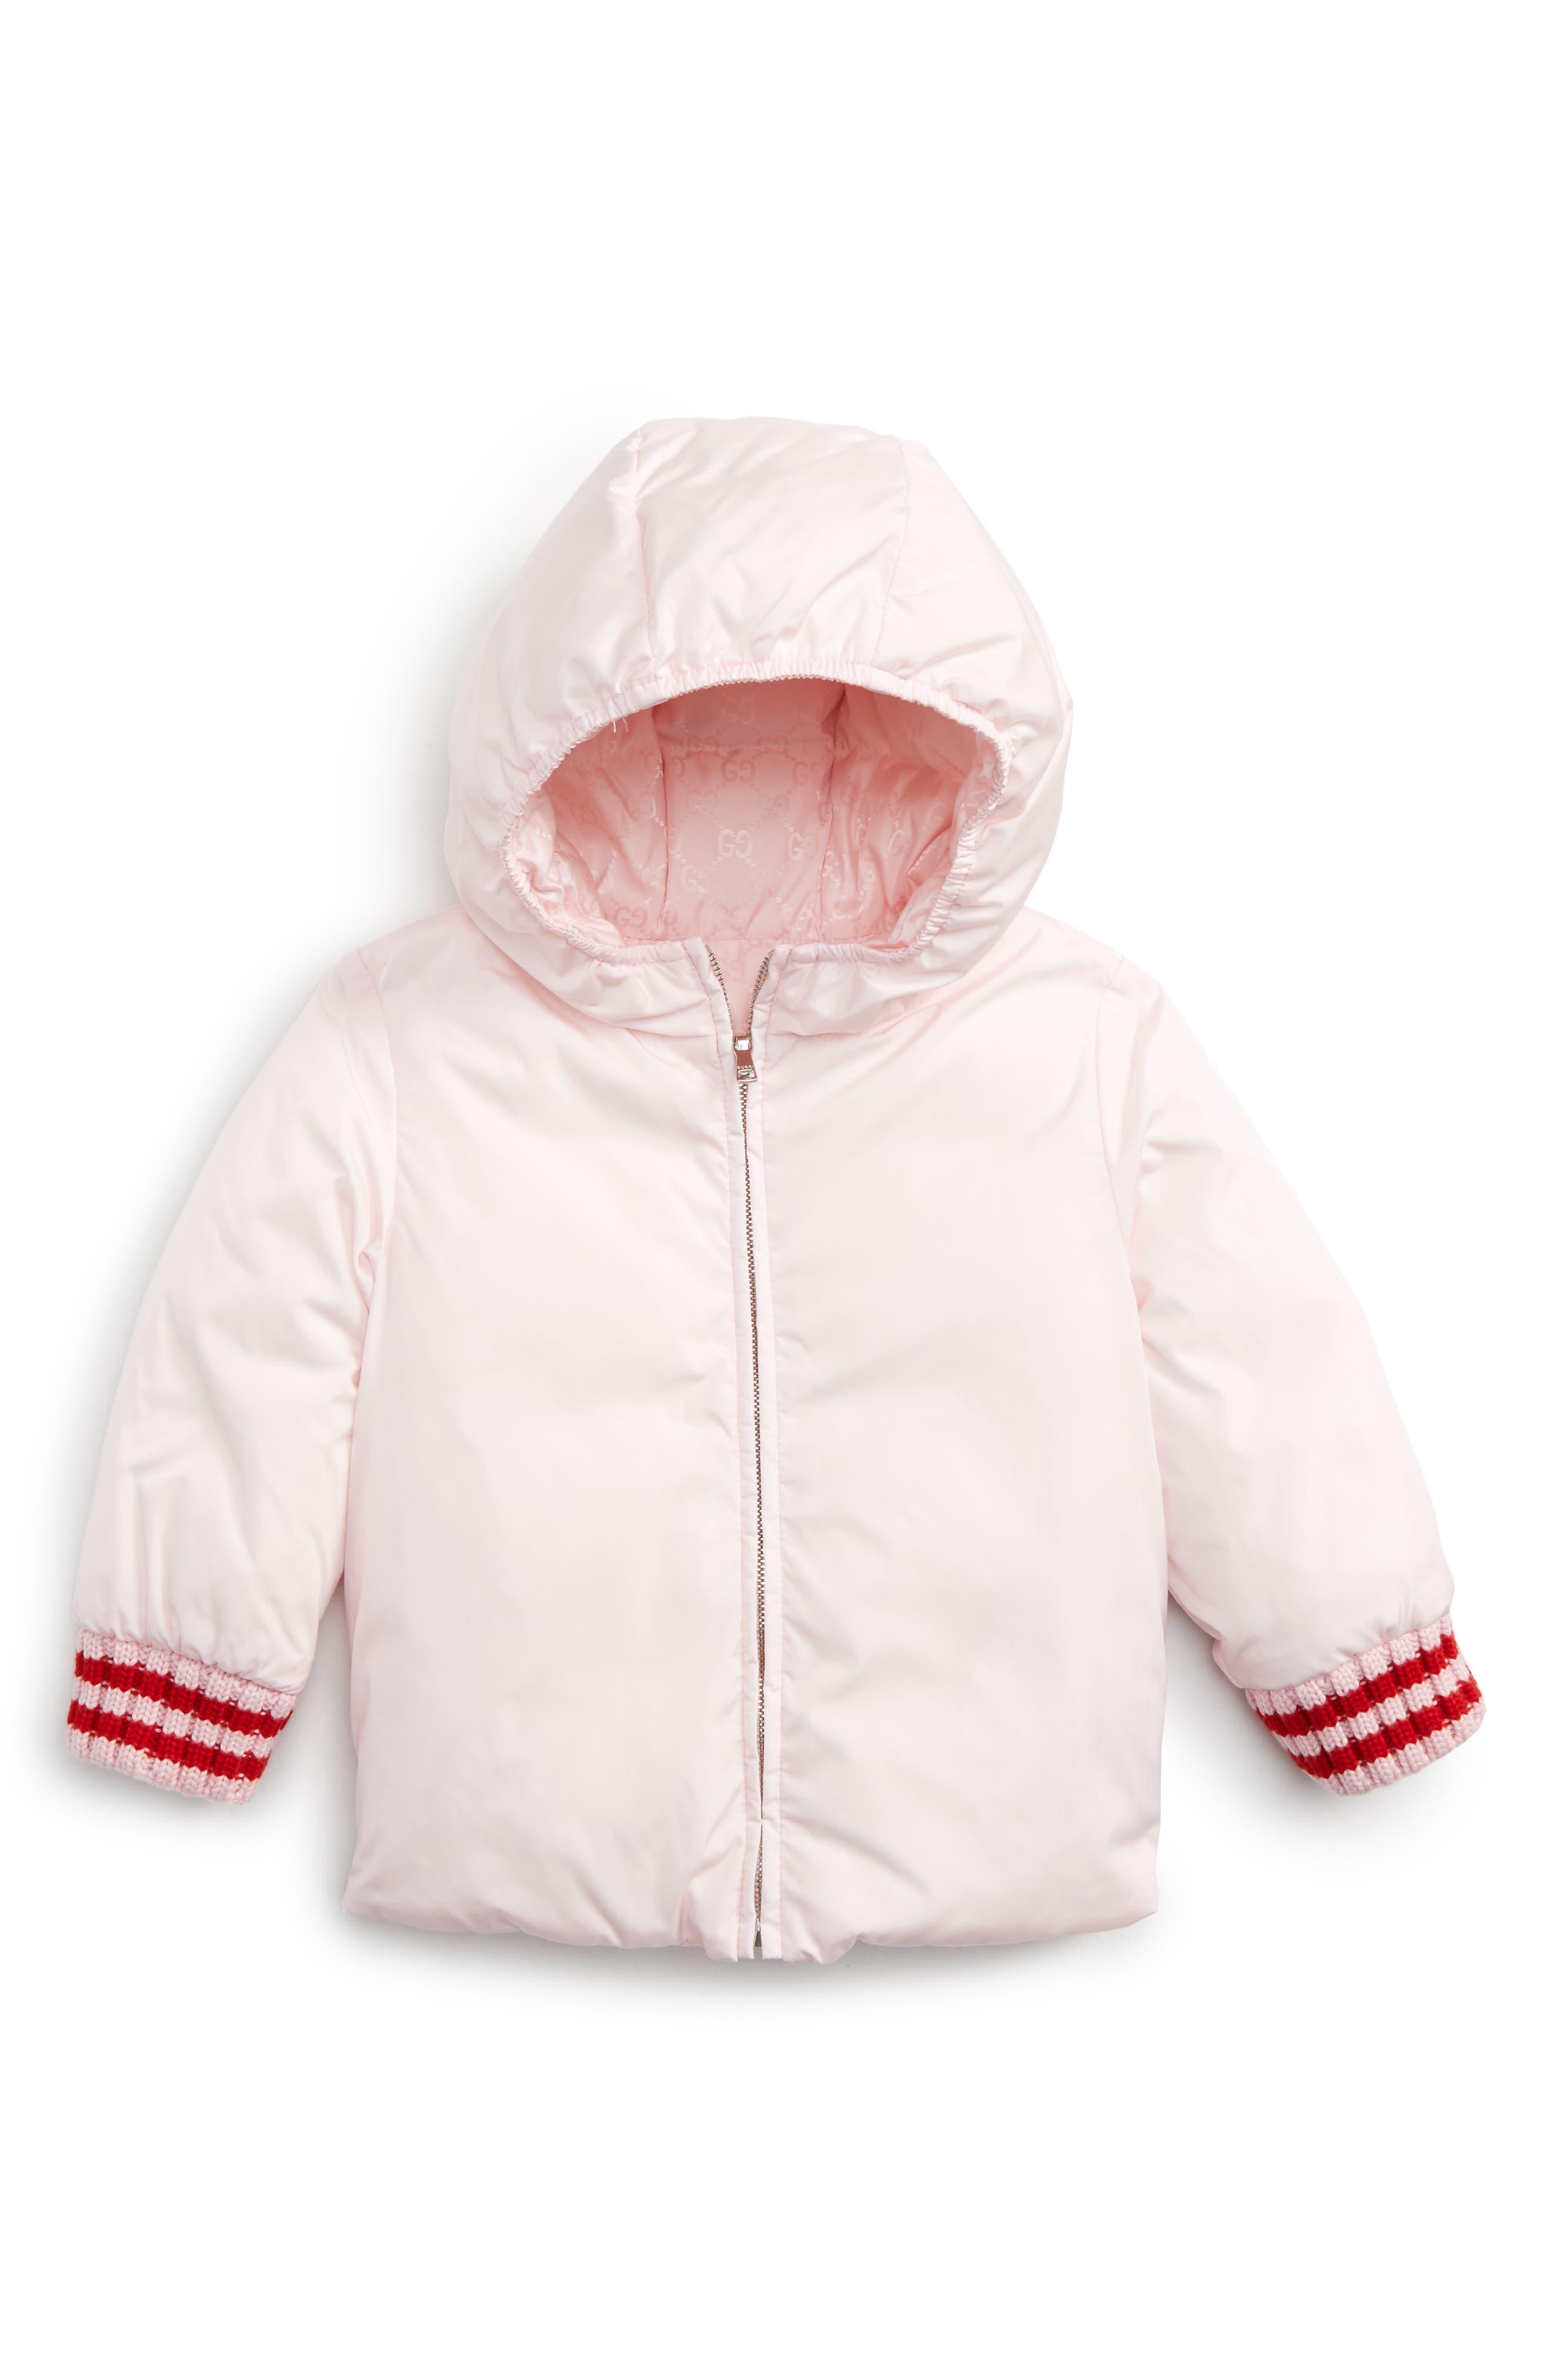 GUCCI, Reversible GG Jacquard Water-Resistant Down Jacket, Main thumbnail 1, color, 667